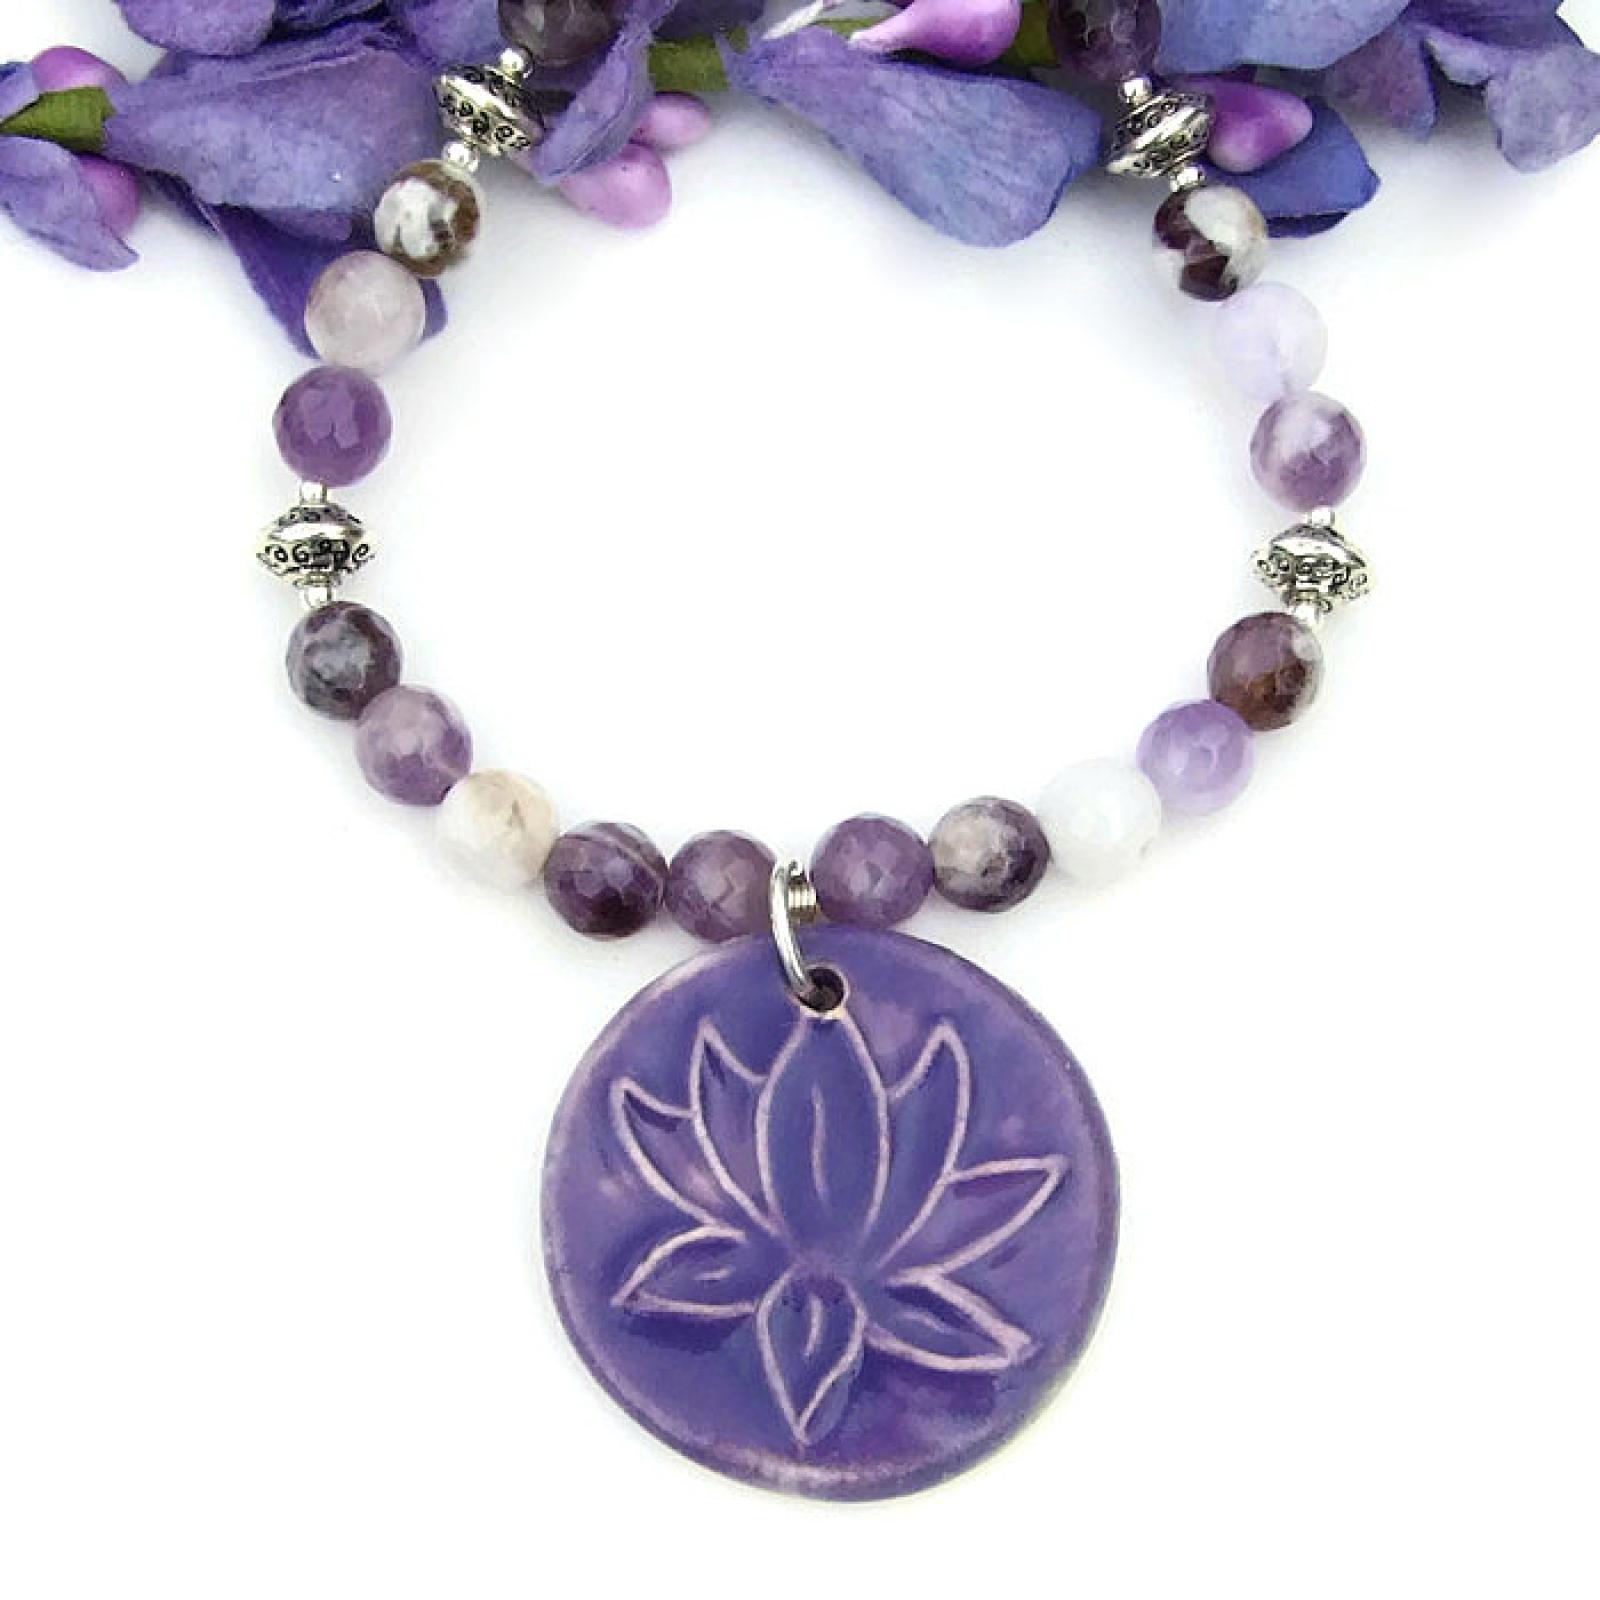 Lotus Flower Yoga Necklace Purple Fire Agate Handmade Jewelry Gift